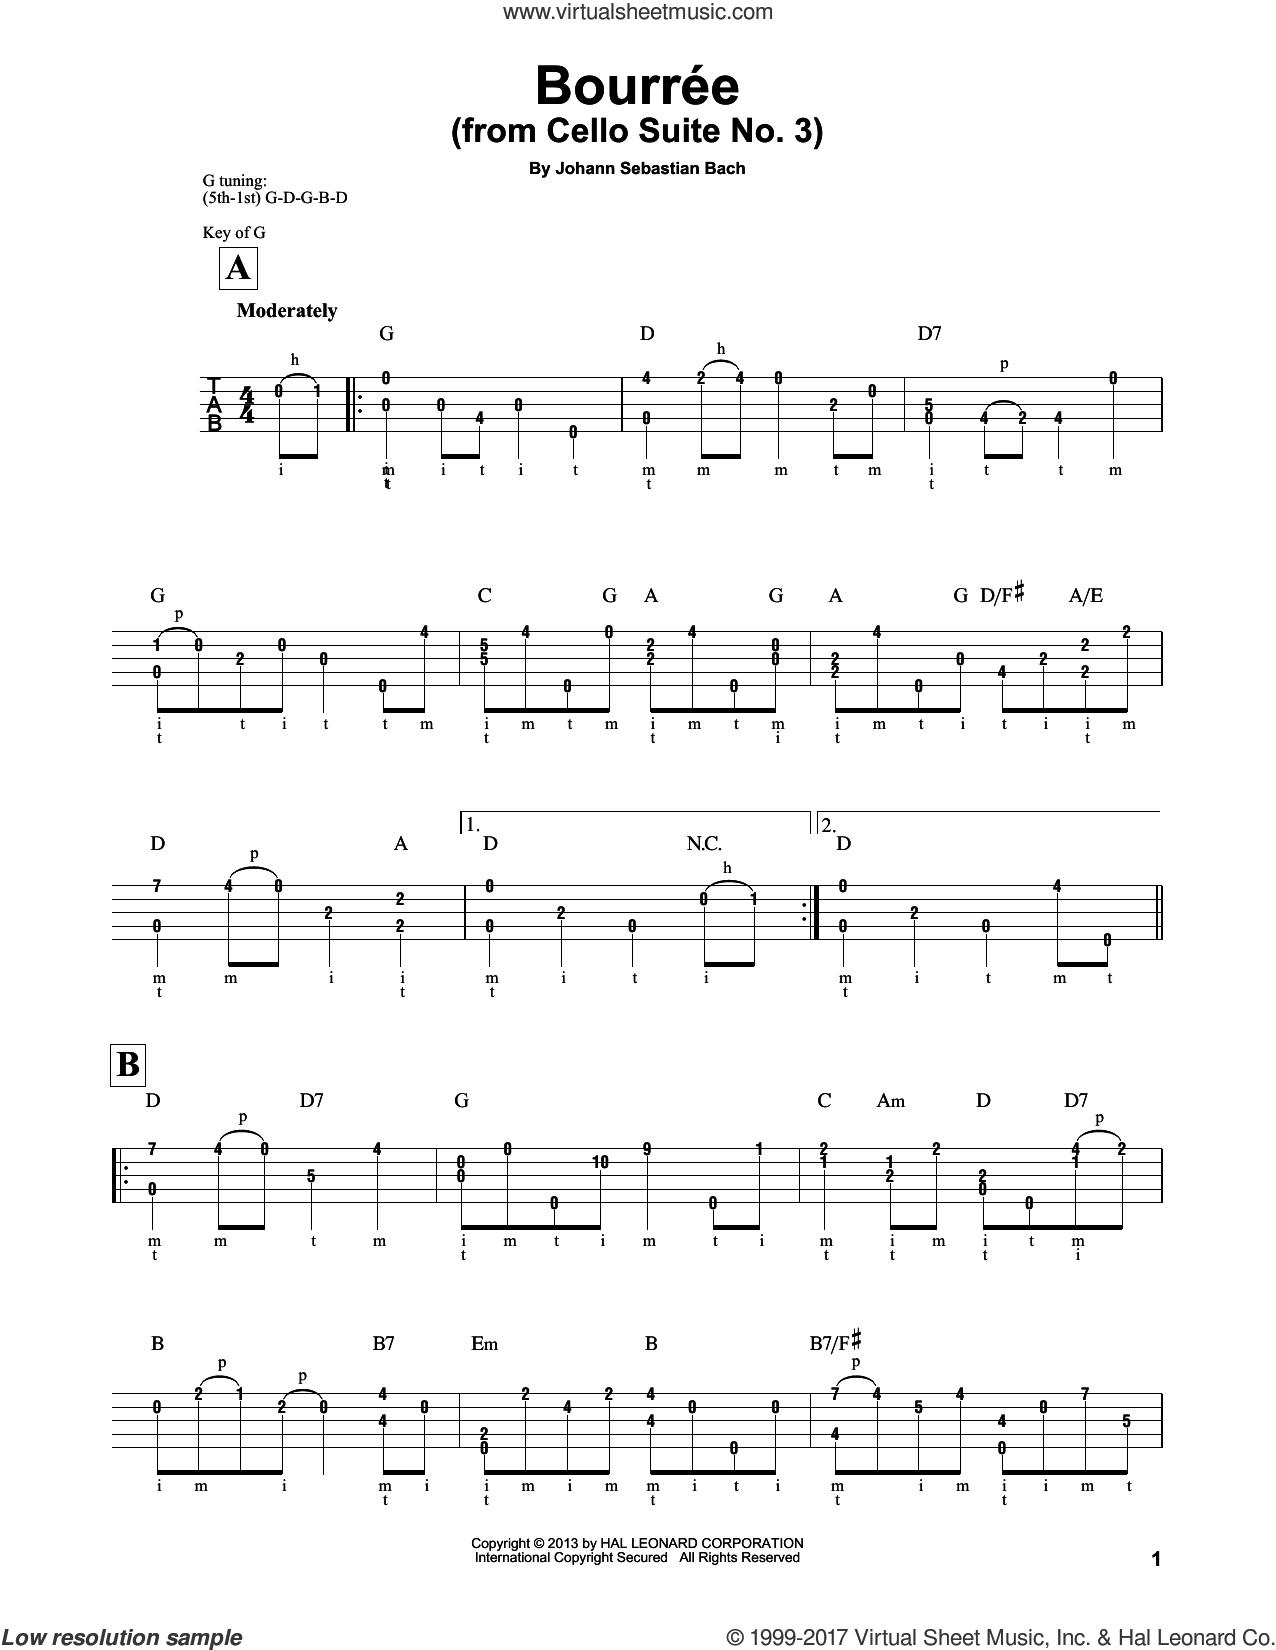 Cello Suite No. 3, BWV 1009 'Bourree I' sheet music for banjo solo by Johann Sebastian Bach and Mark Phillips, classical score, intermediate skill level